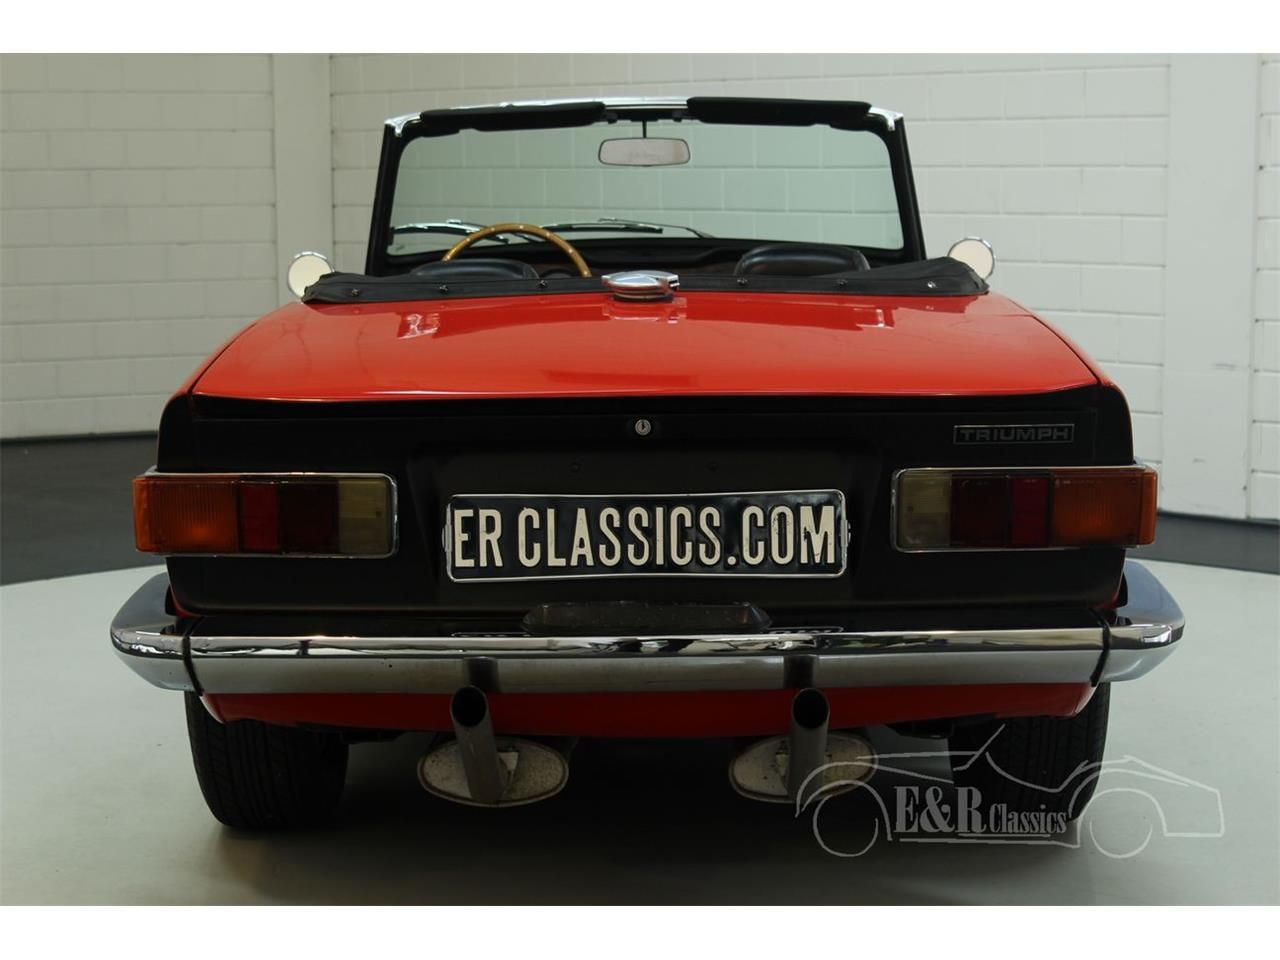 1970 Triumph TR6 (CC-1415591) for sale in Waalwijk, Noord-Brabant